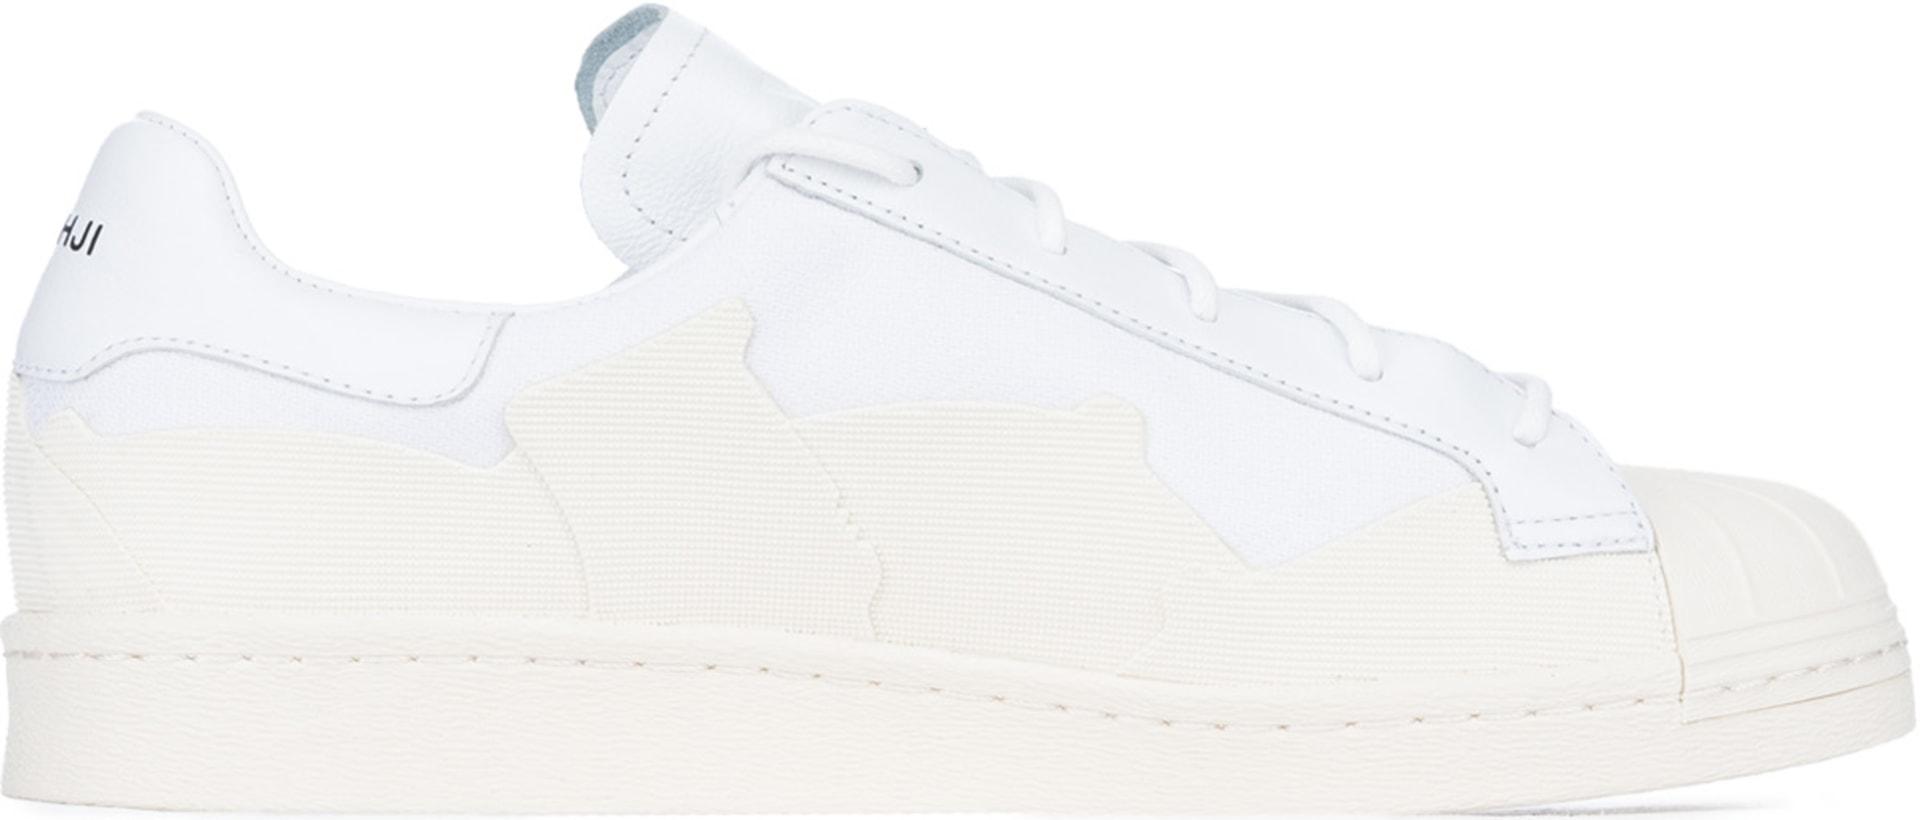 6c7aea9d298 Y-3  Super Takusan - Chaussure Blanc Blanc Cassé